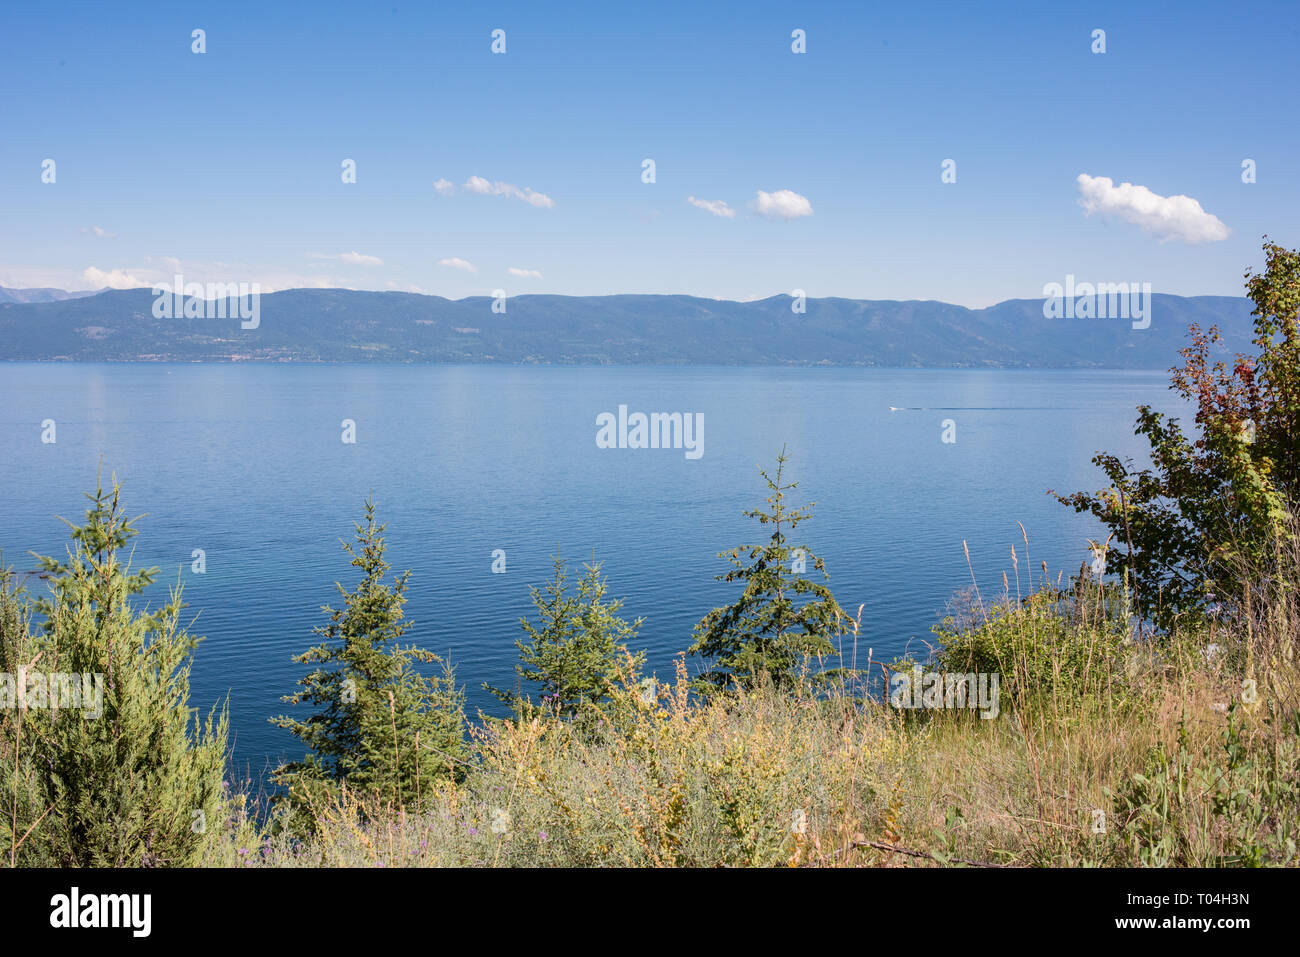 Flathead Lake, near Kalispell, Montana, is nearly 30 miles long and